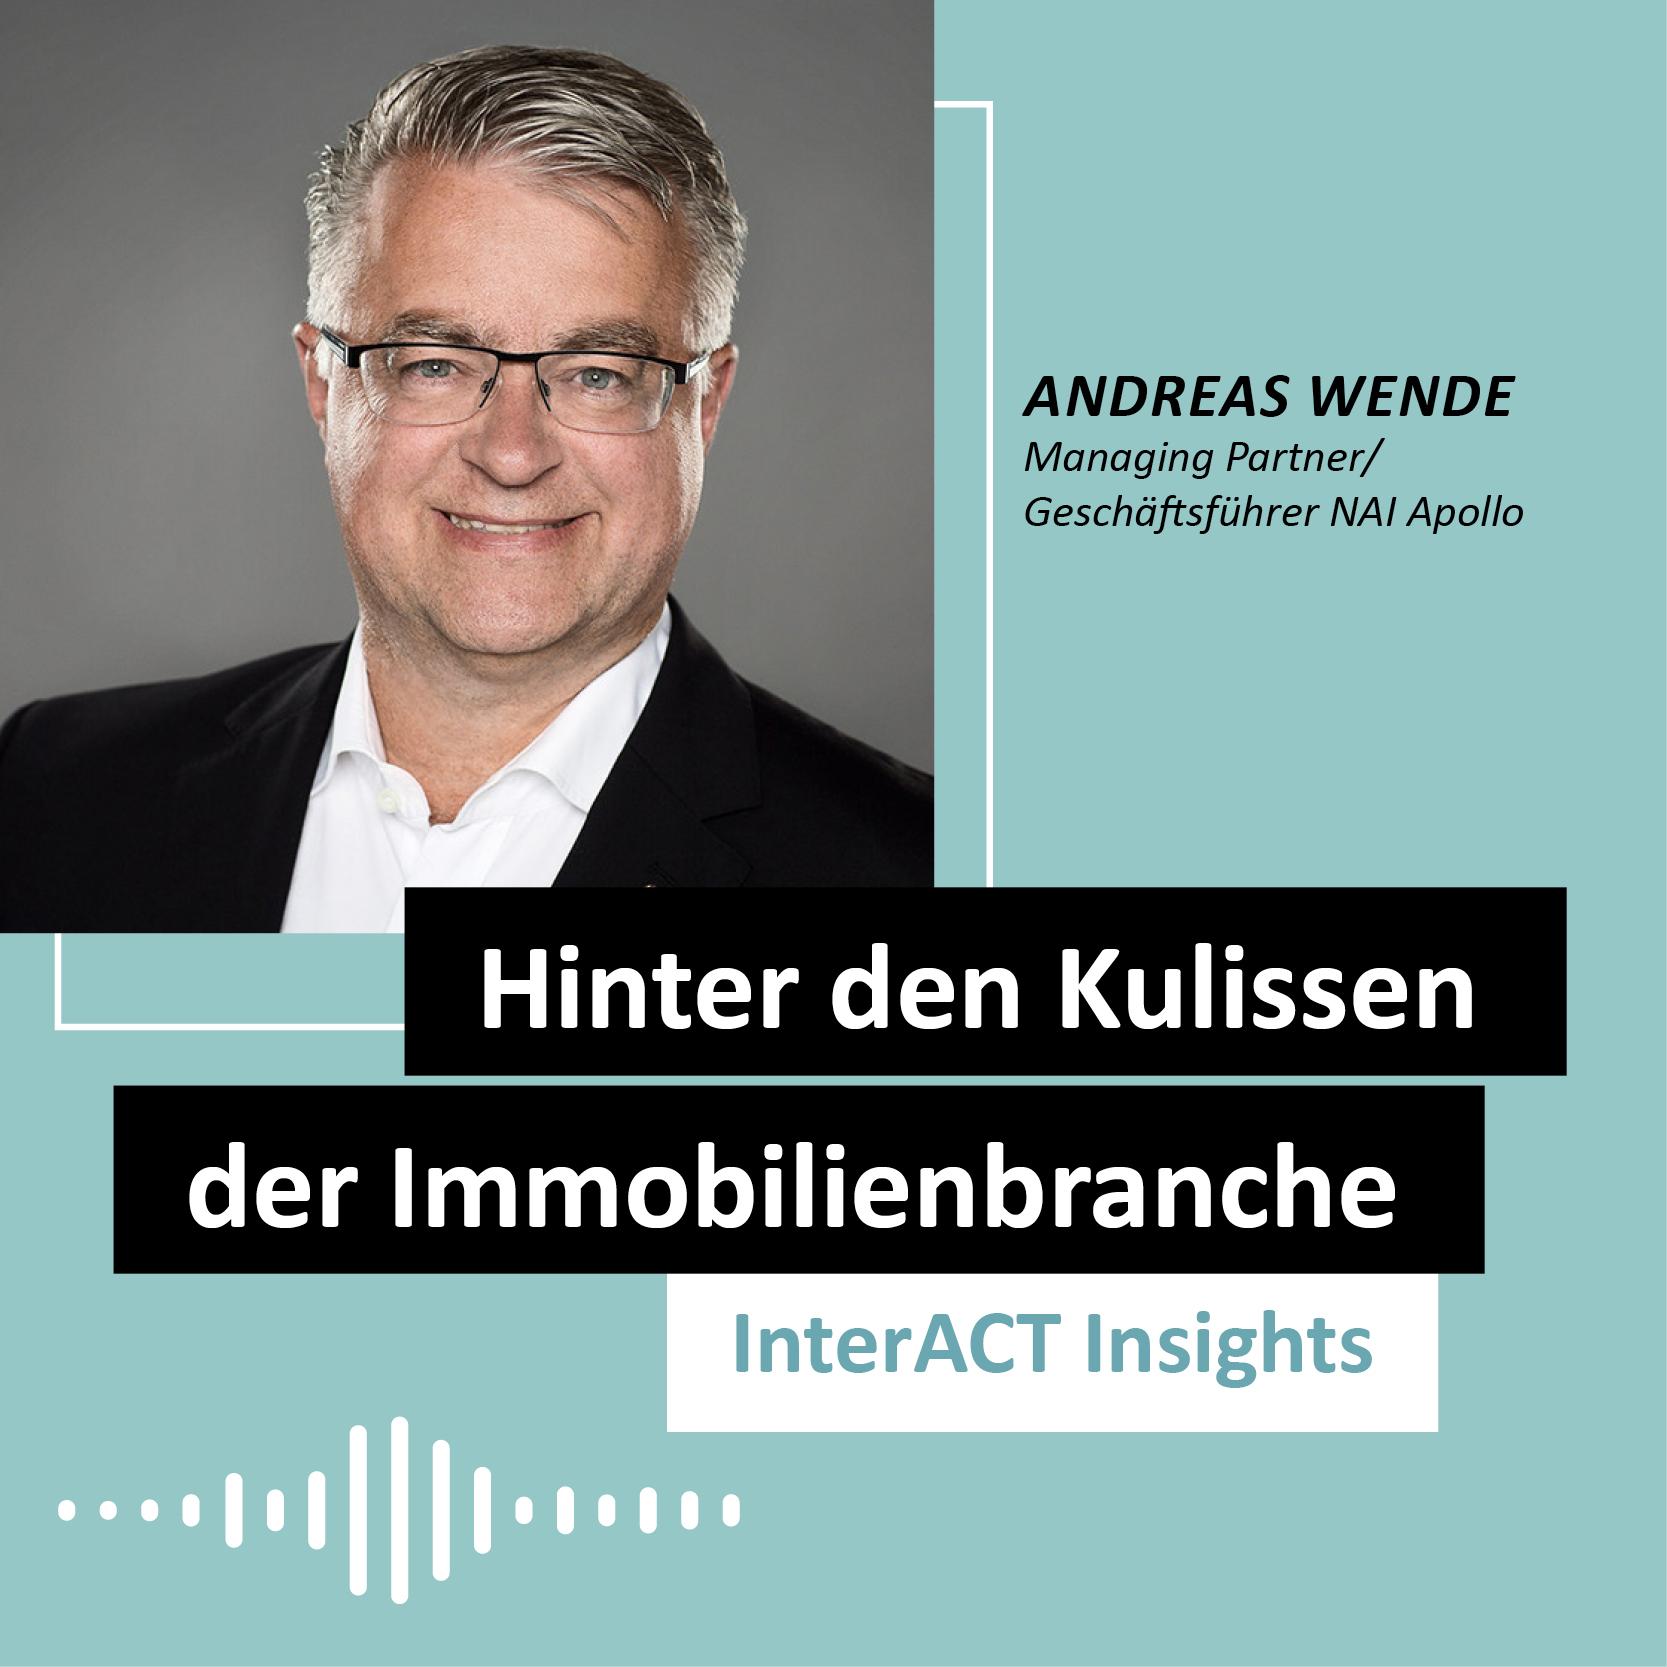 "Podcastfolge mit Andreas Wende - ""Hinter den Kulissen der Immobilienbranche"" - InterACT Insights"